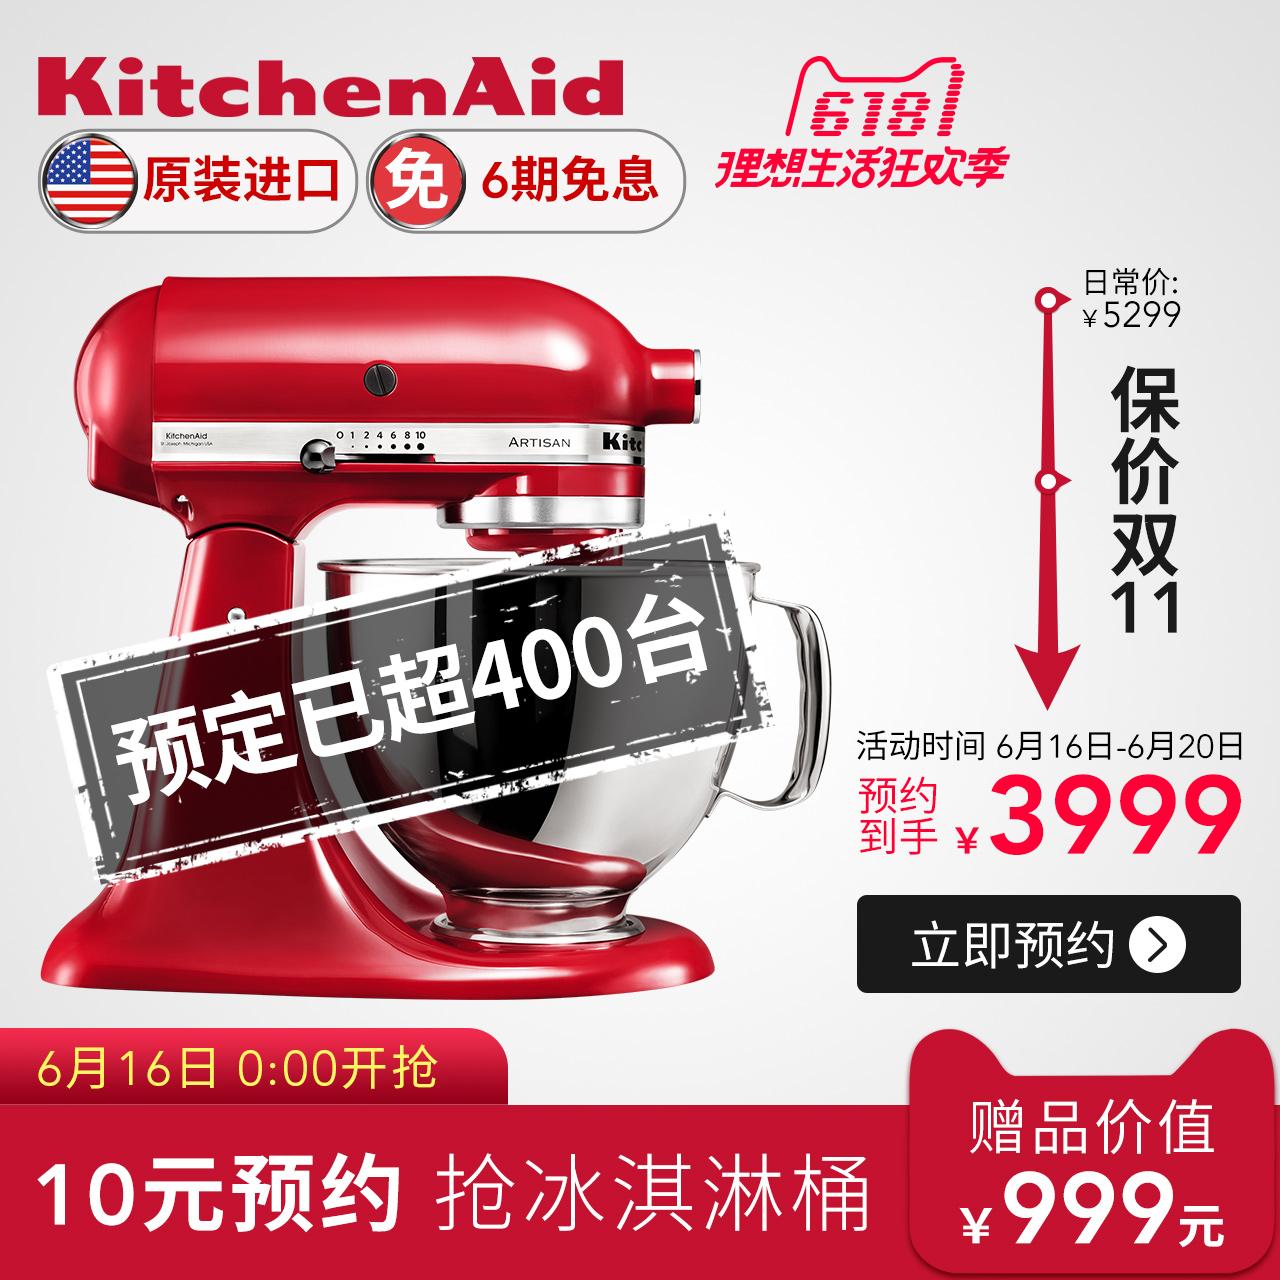 kitchenaid 5KSM150料理机质量好吗,网友爆料